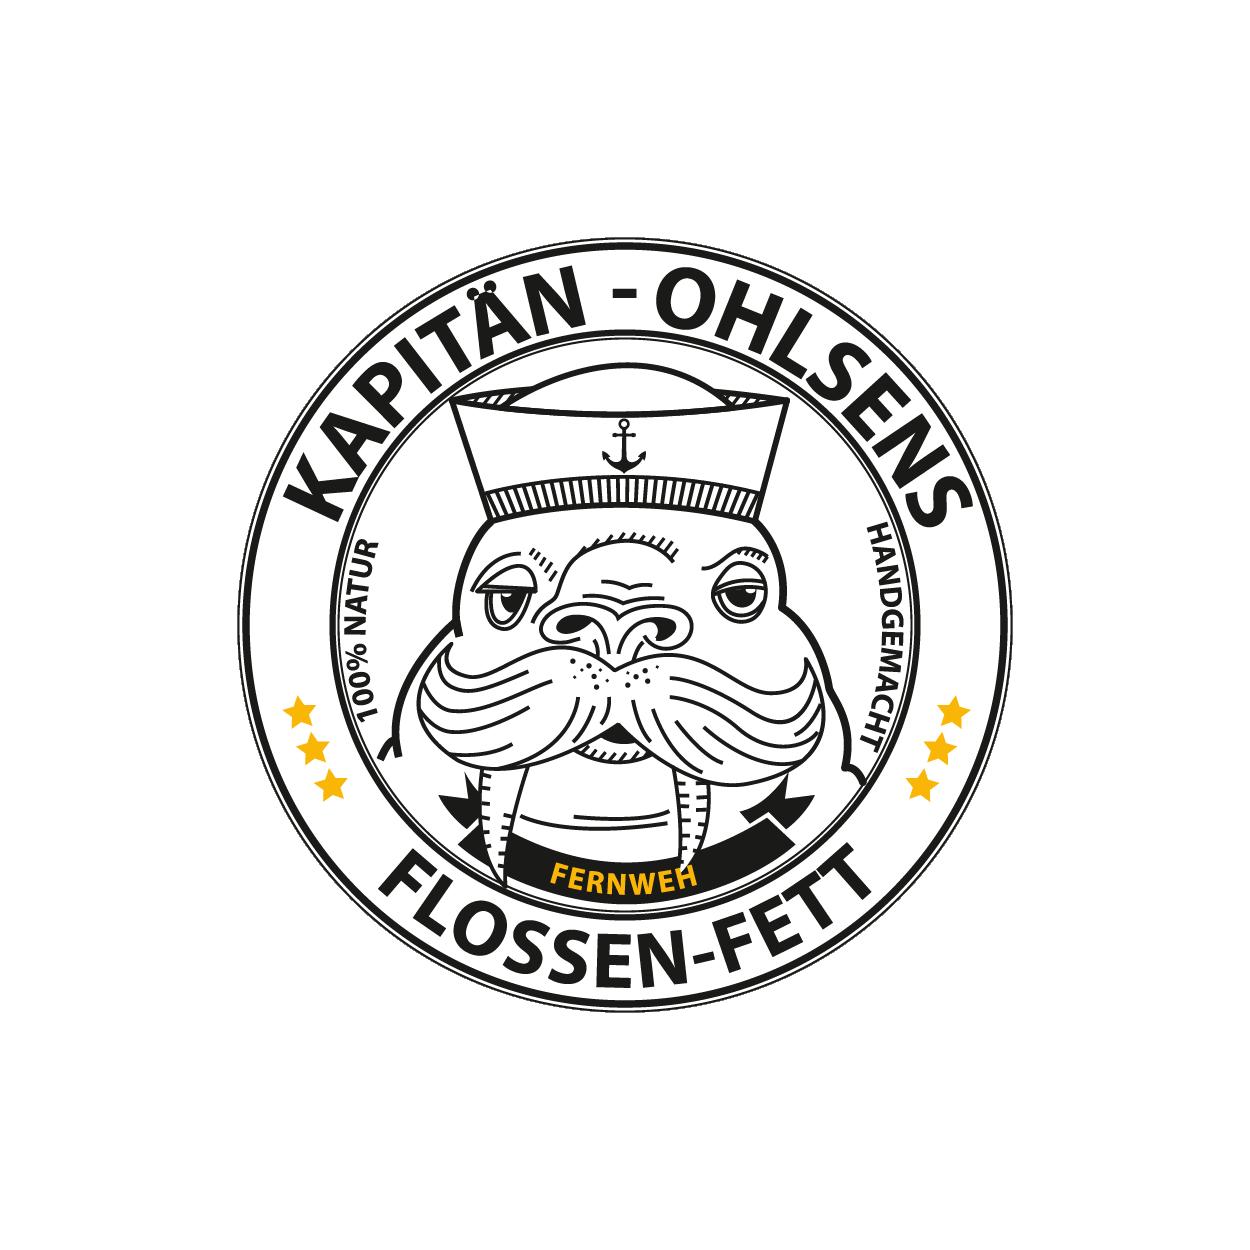 Flossen-Fett Logo, Logogestaltung, Logoentwurf, Logos, Referenz